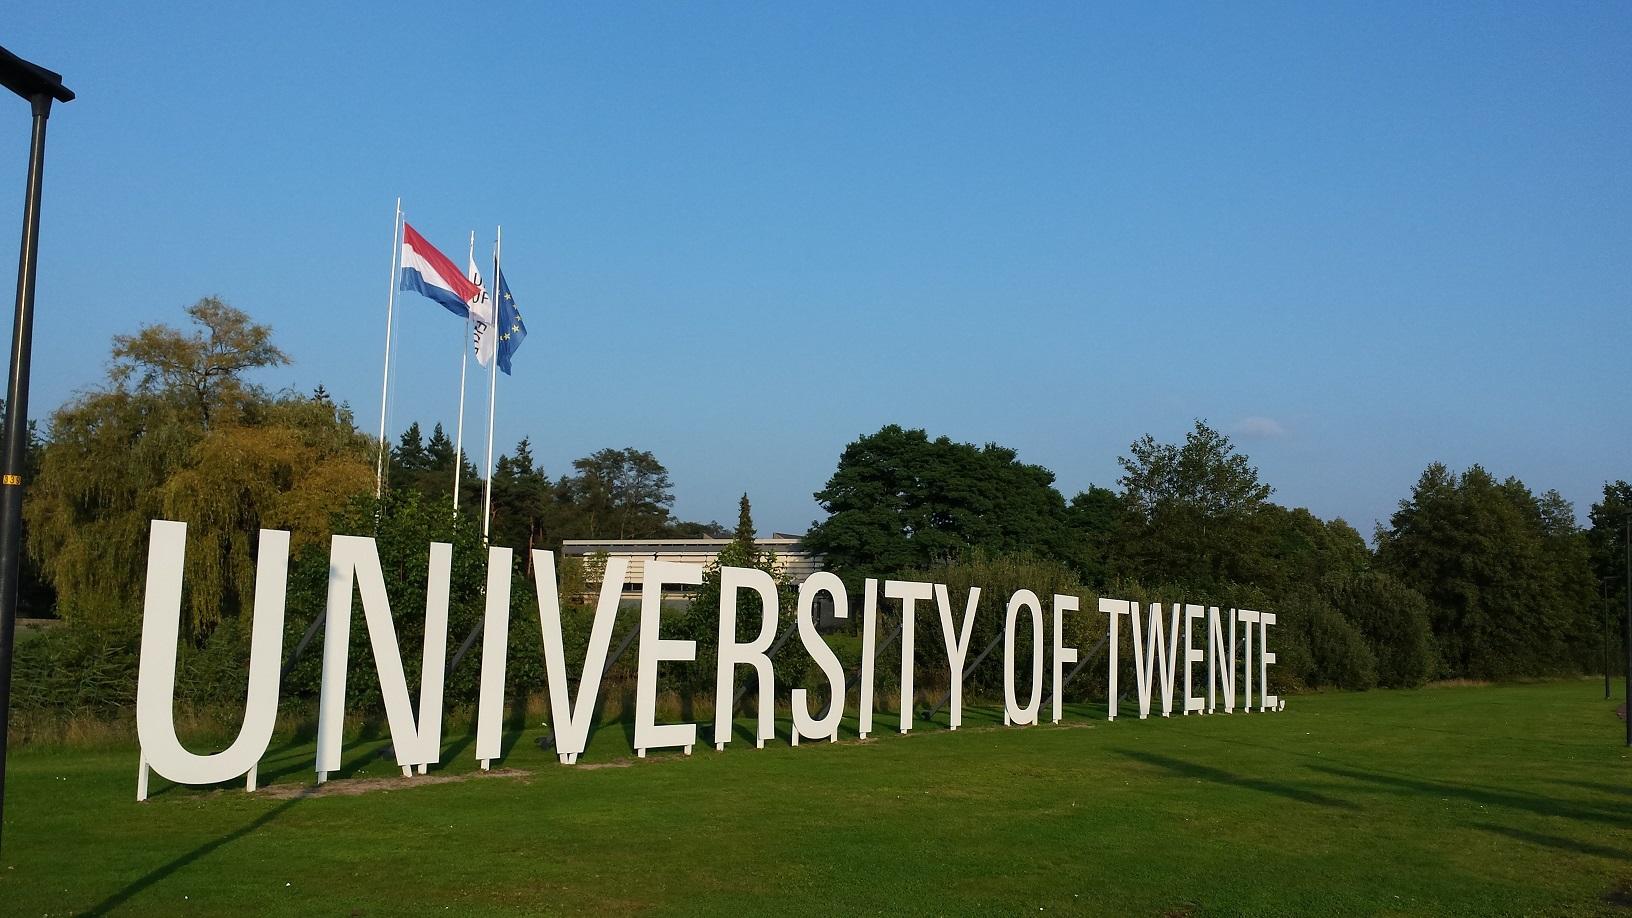 University of Twente - Wikipedia